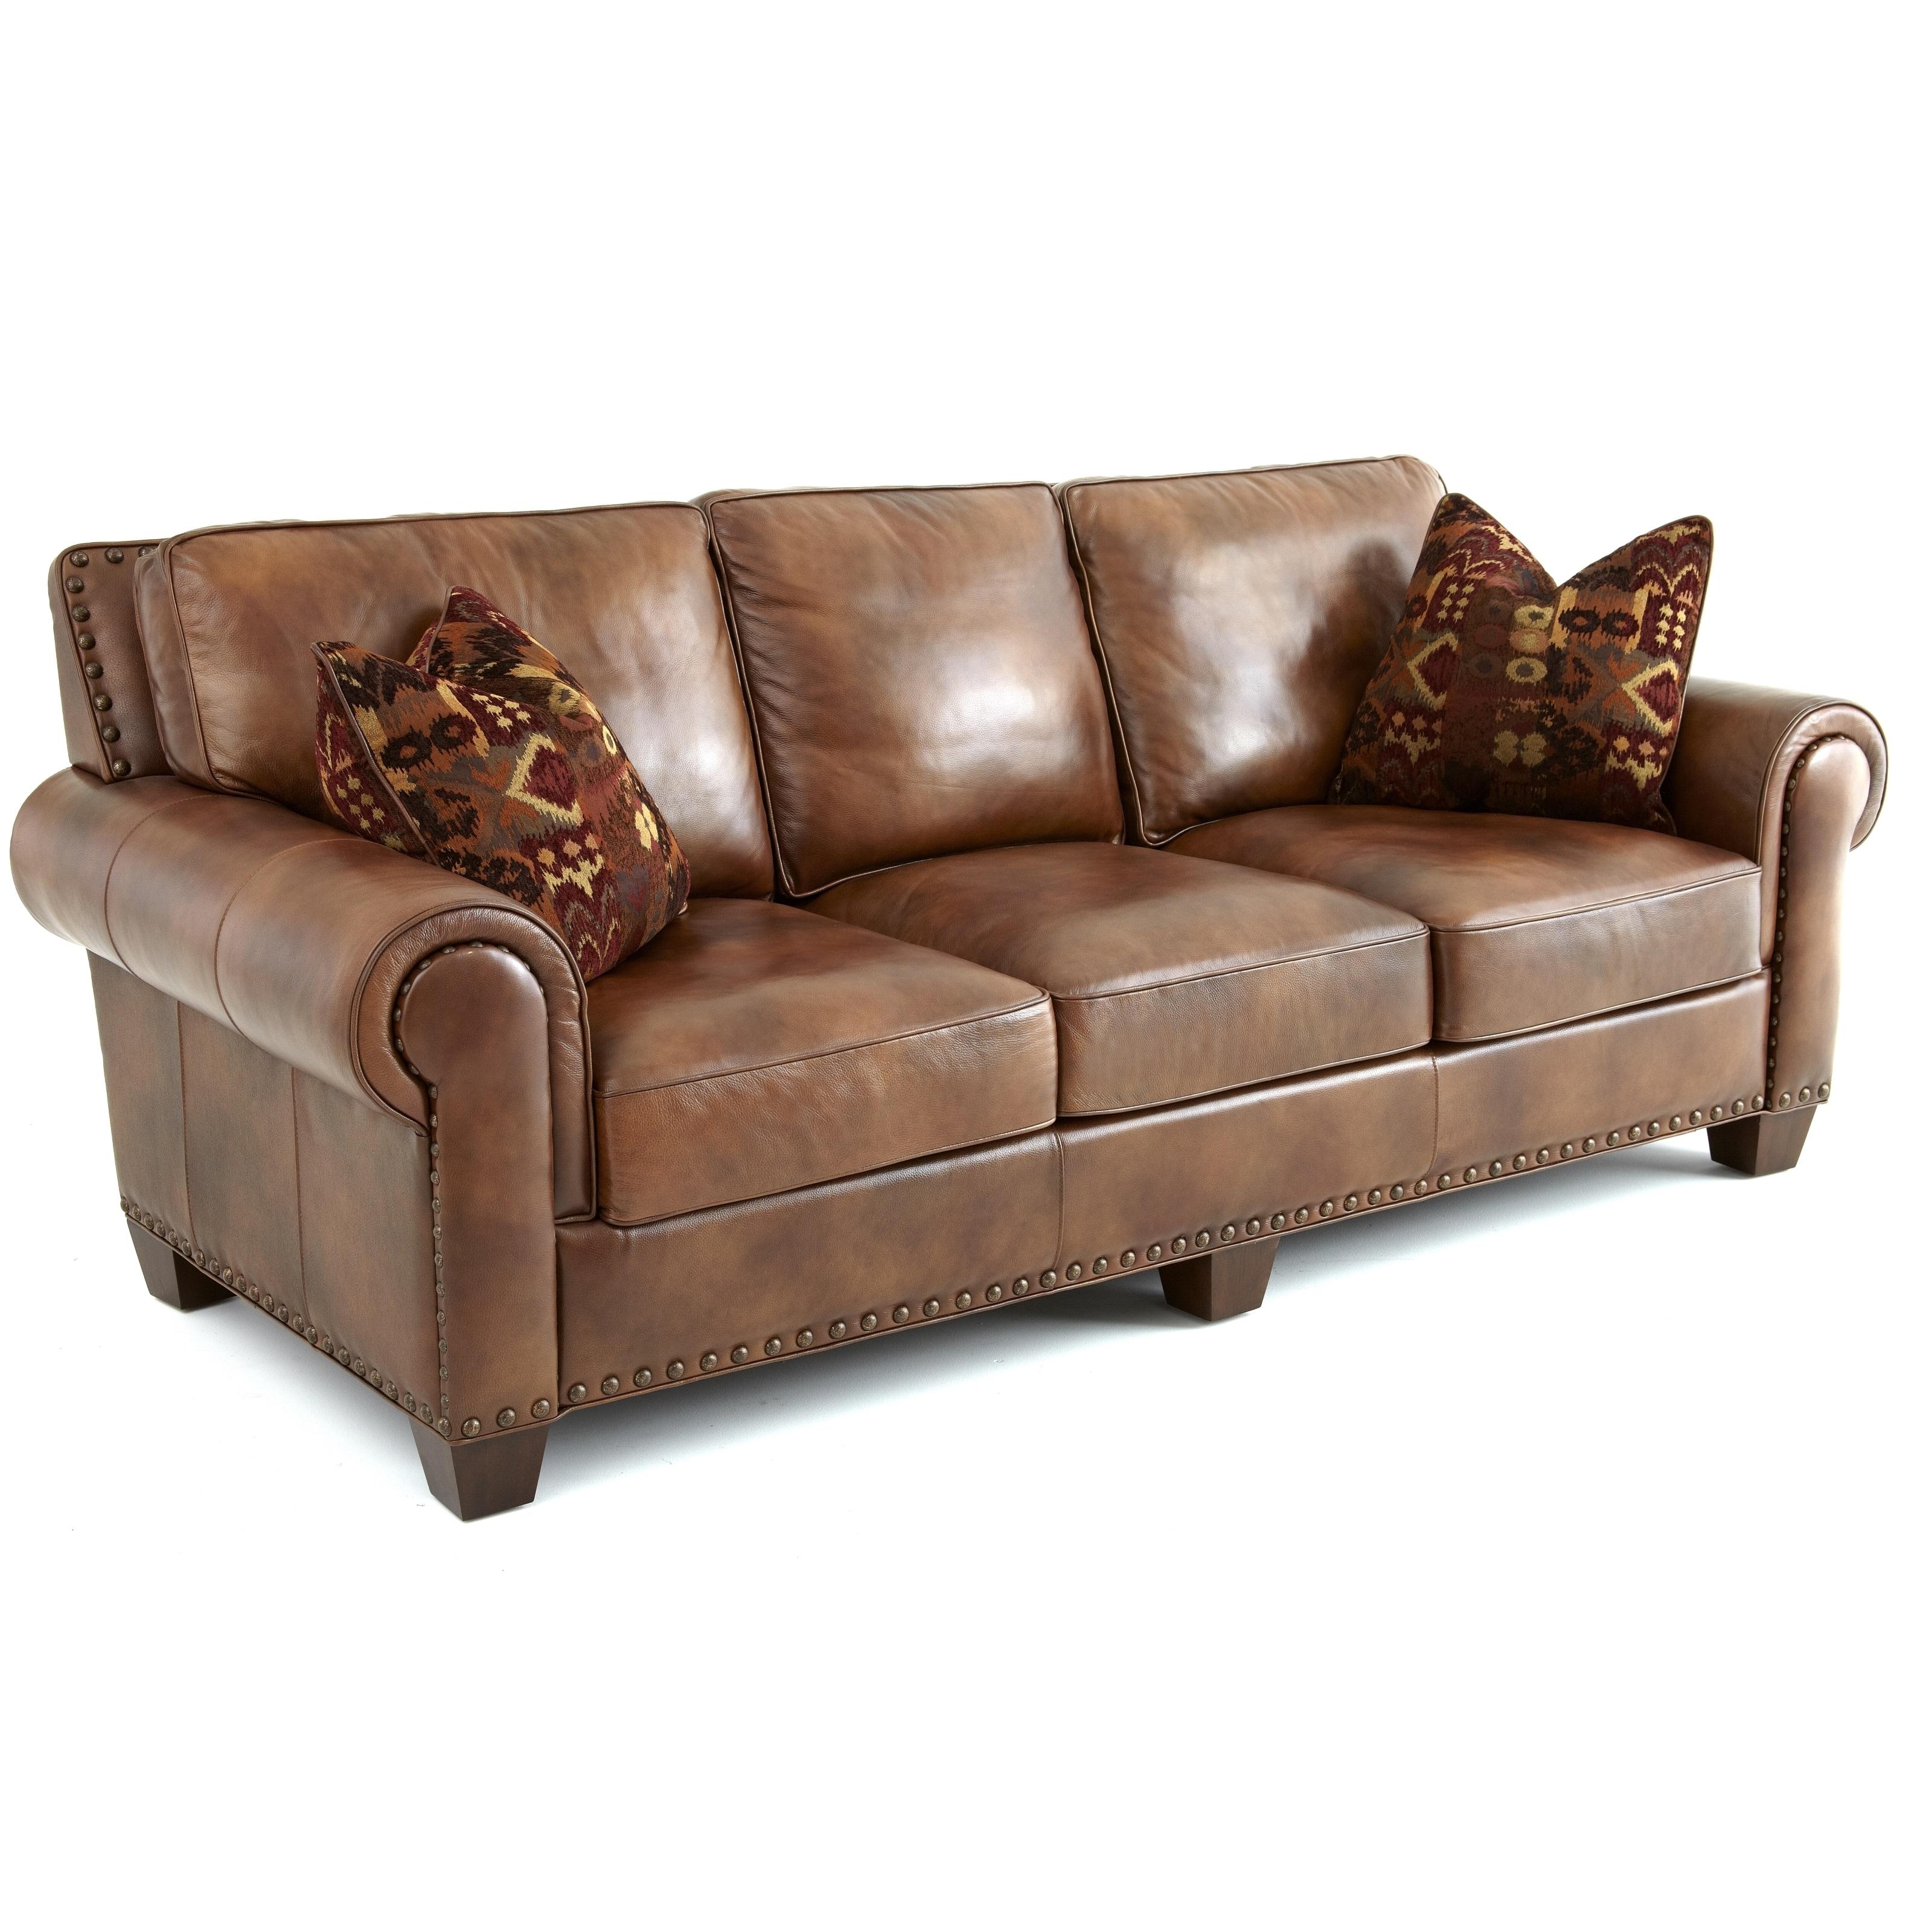 Shop Sanremo 4 Piece Top Grain Leather Sofa Set By Greyson Living - San-remo-contemporary-leather-sofa